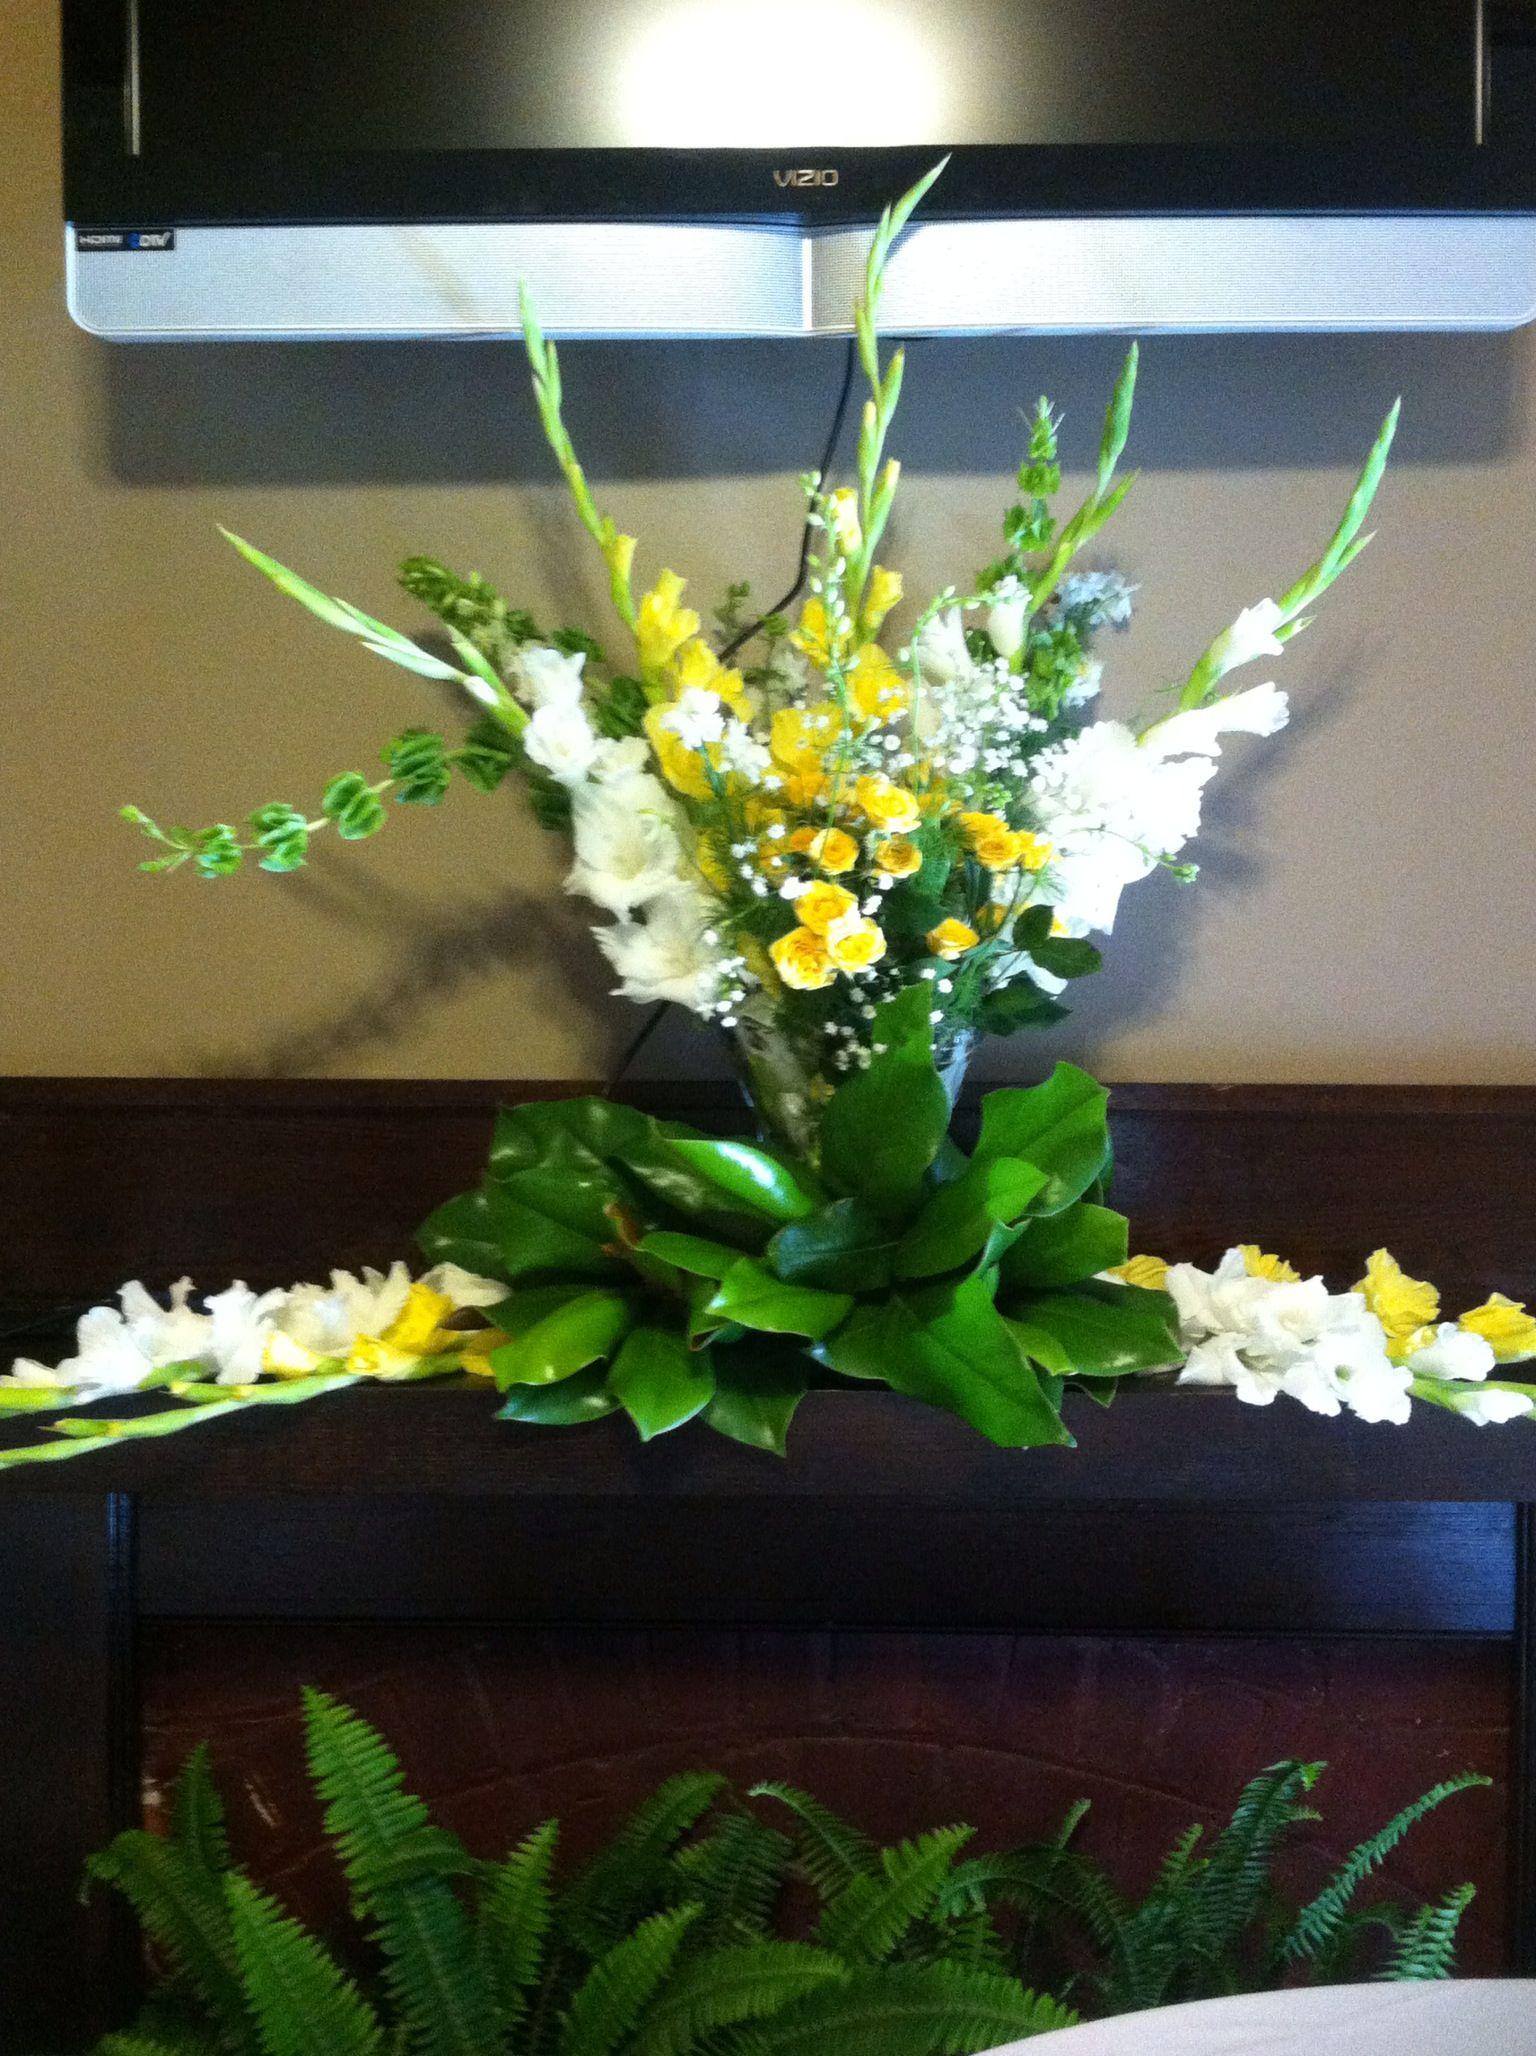 50th wedding anniversary flower arrangements pinterest wedding 50th wedding anniversary 50th wedding anniversaryflower arrangementsflower arrangementfloral arrangements izmirmasajfo